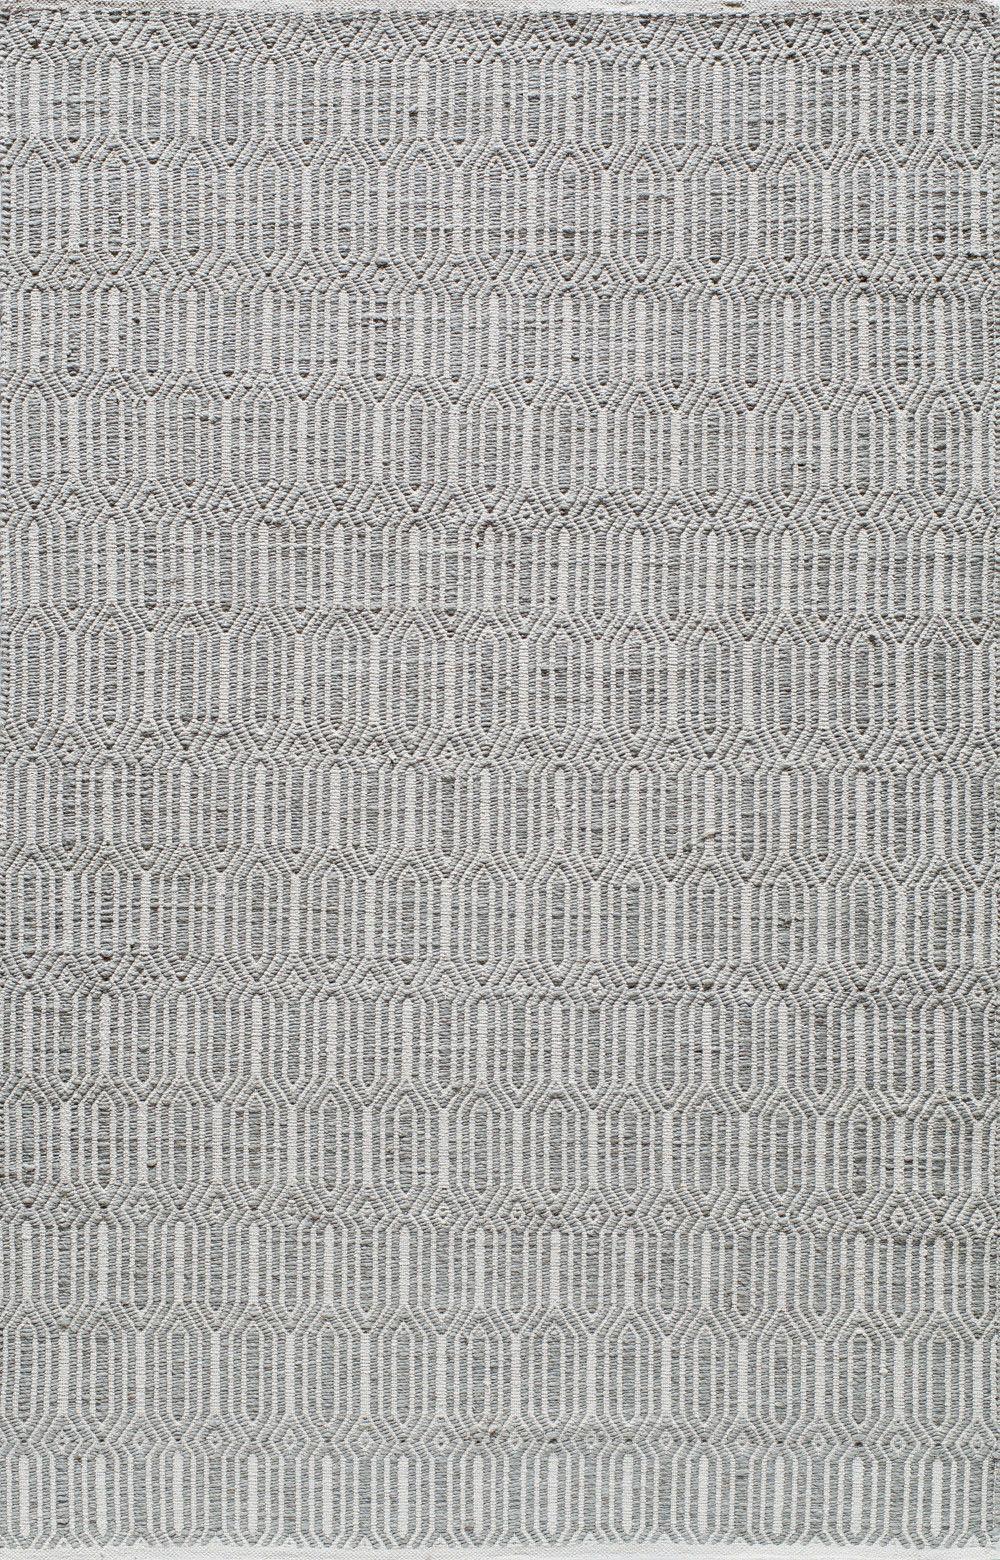 Hand-Woven Silver Area Rug